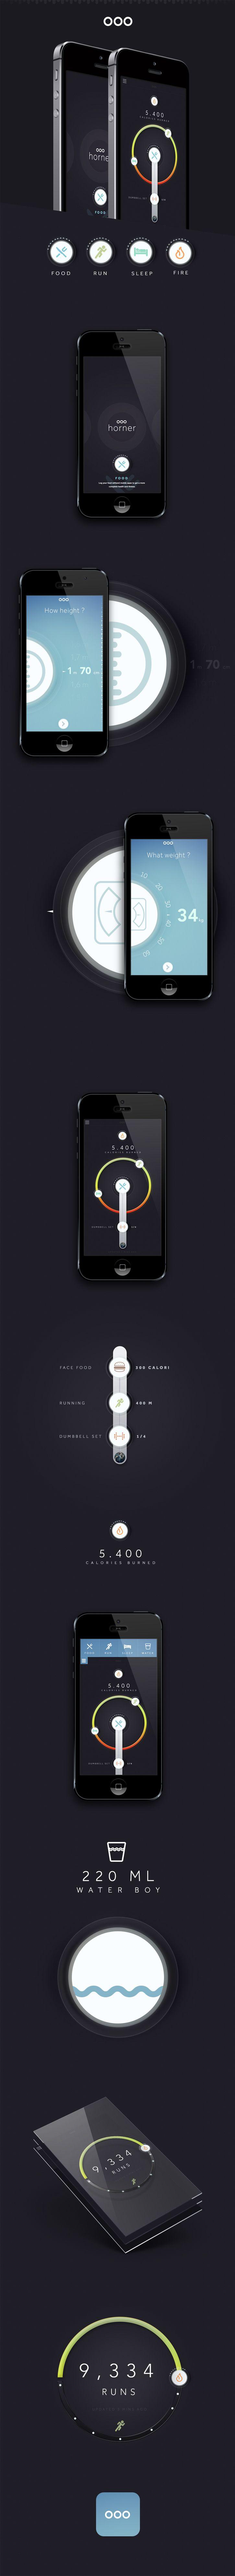 Nice app controlling calories, activities etc..